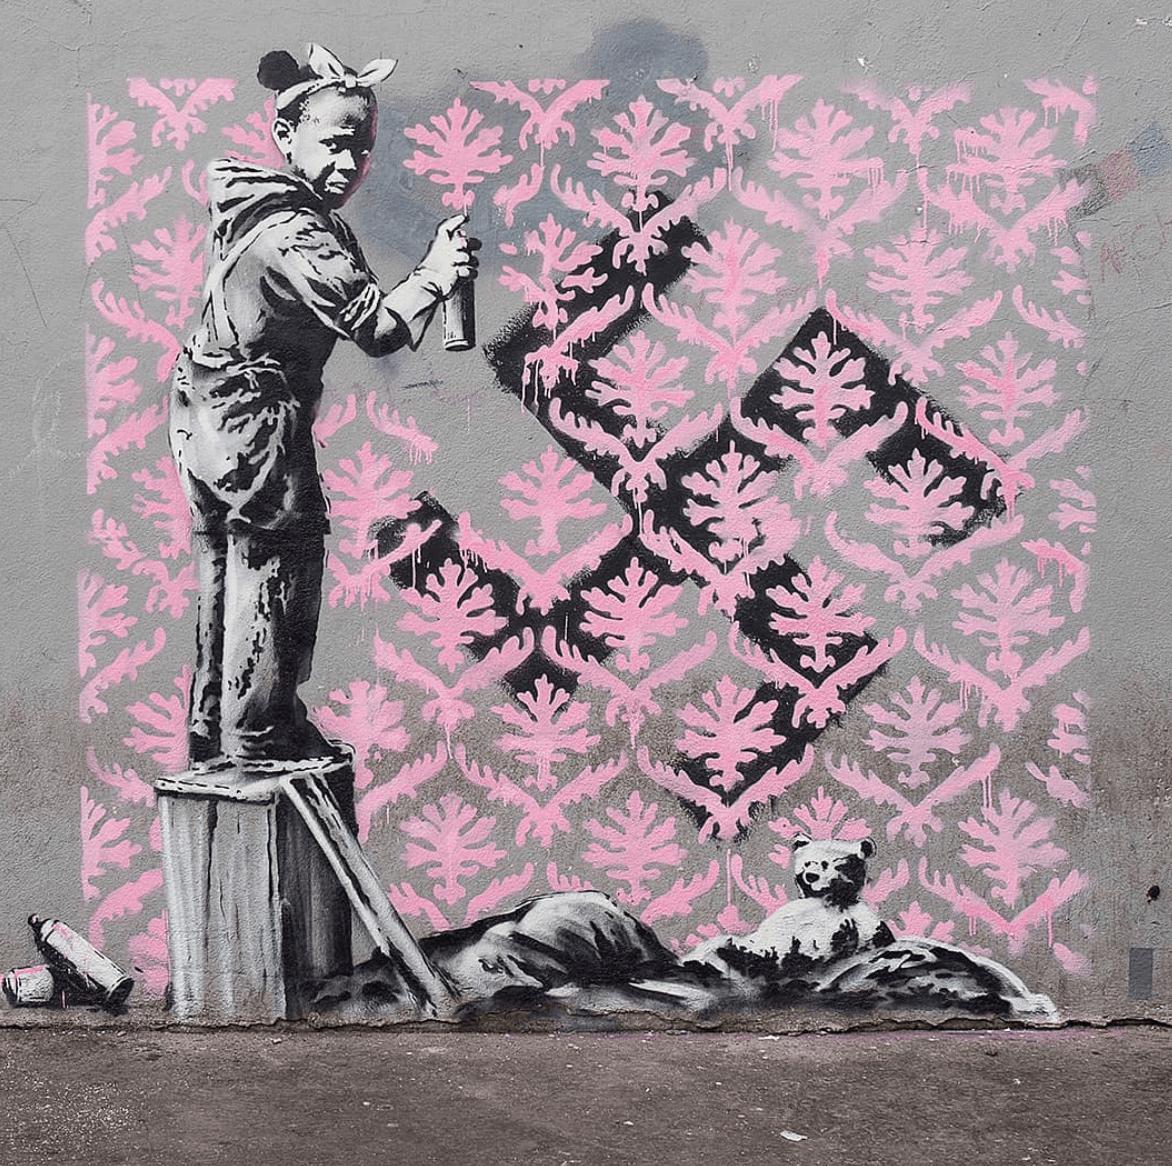 Banksy stencil art paris 2018 photo credit banksy